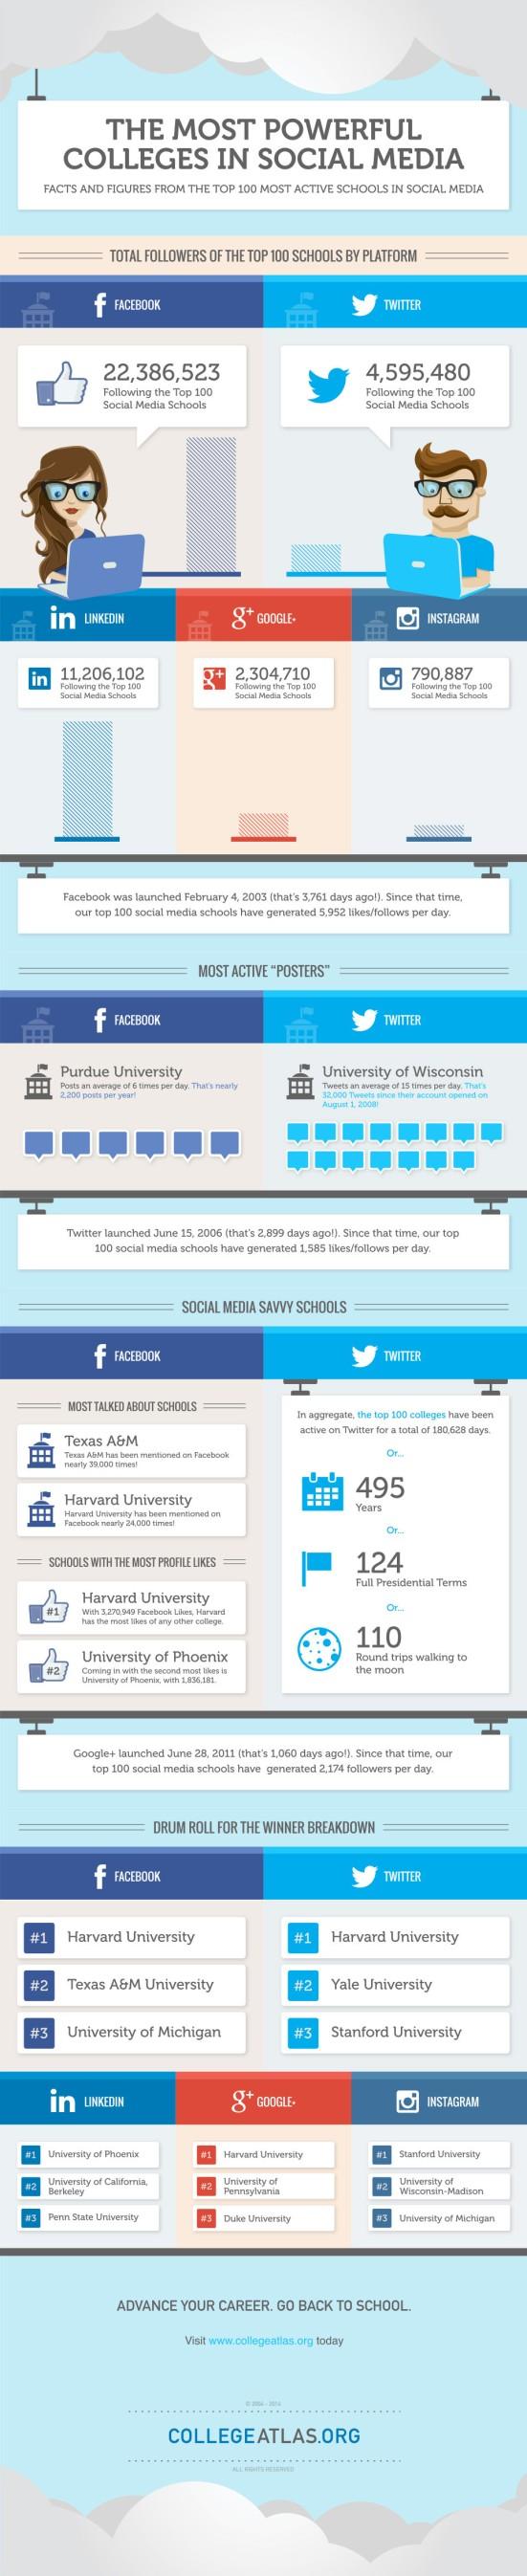 MostPowerfulCollegesInSocialMedia_Infographic